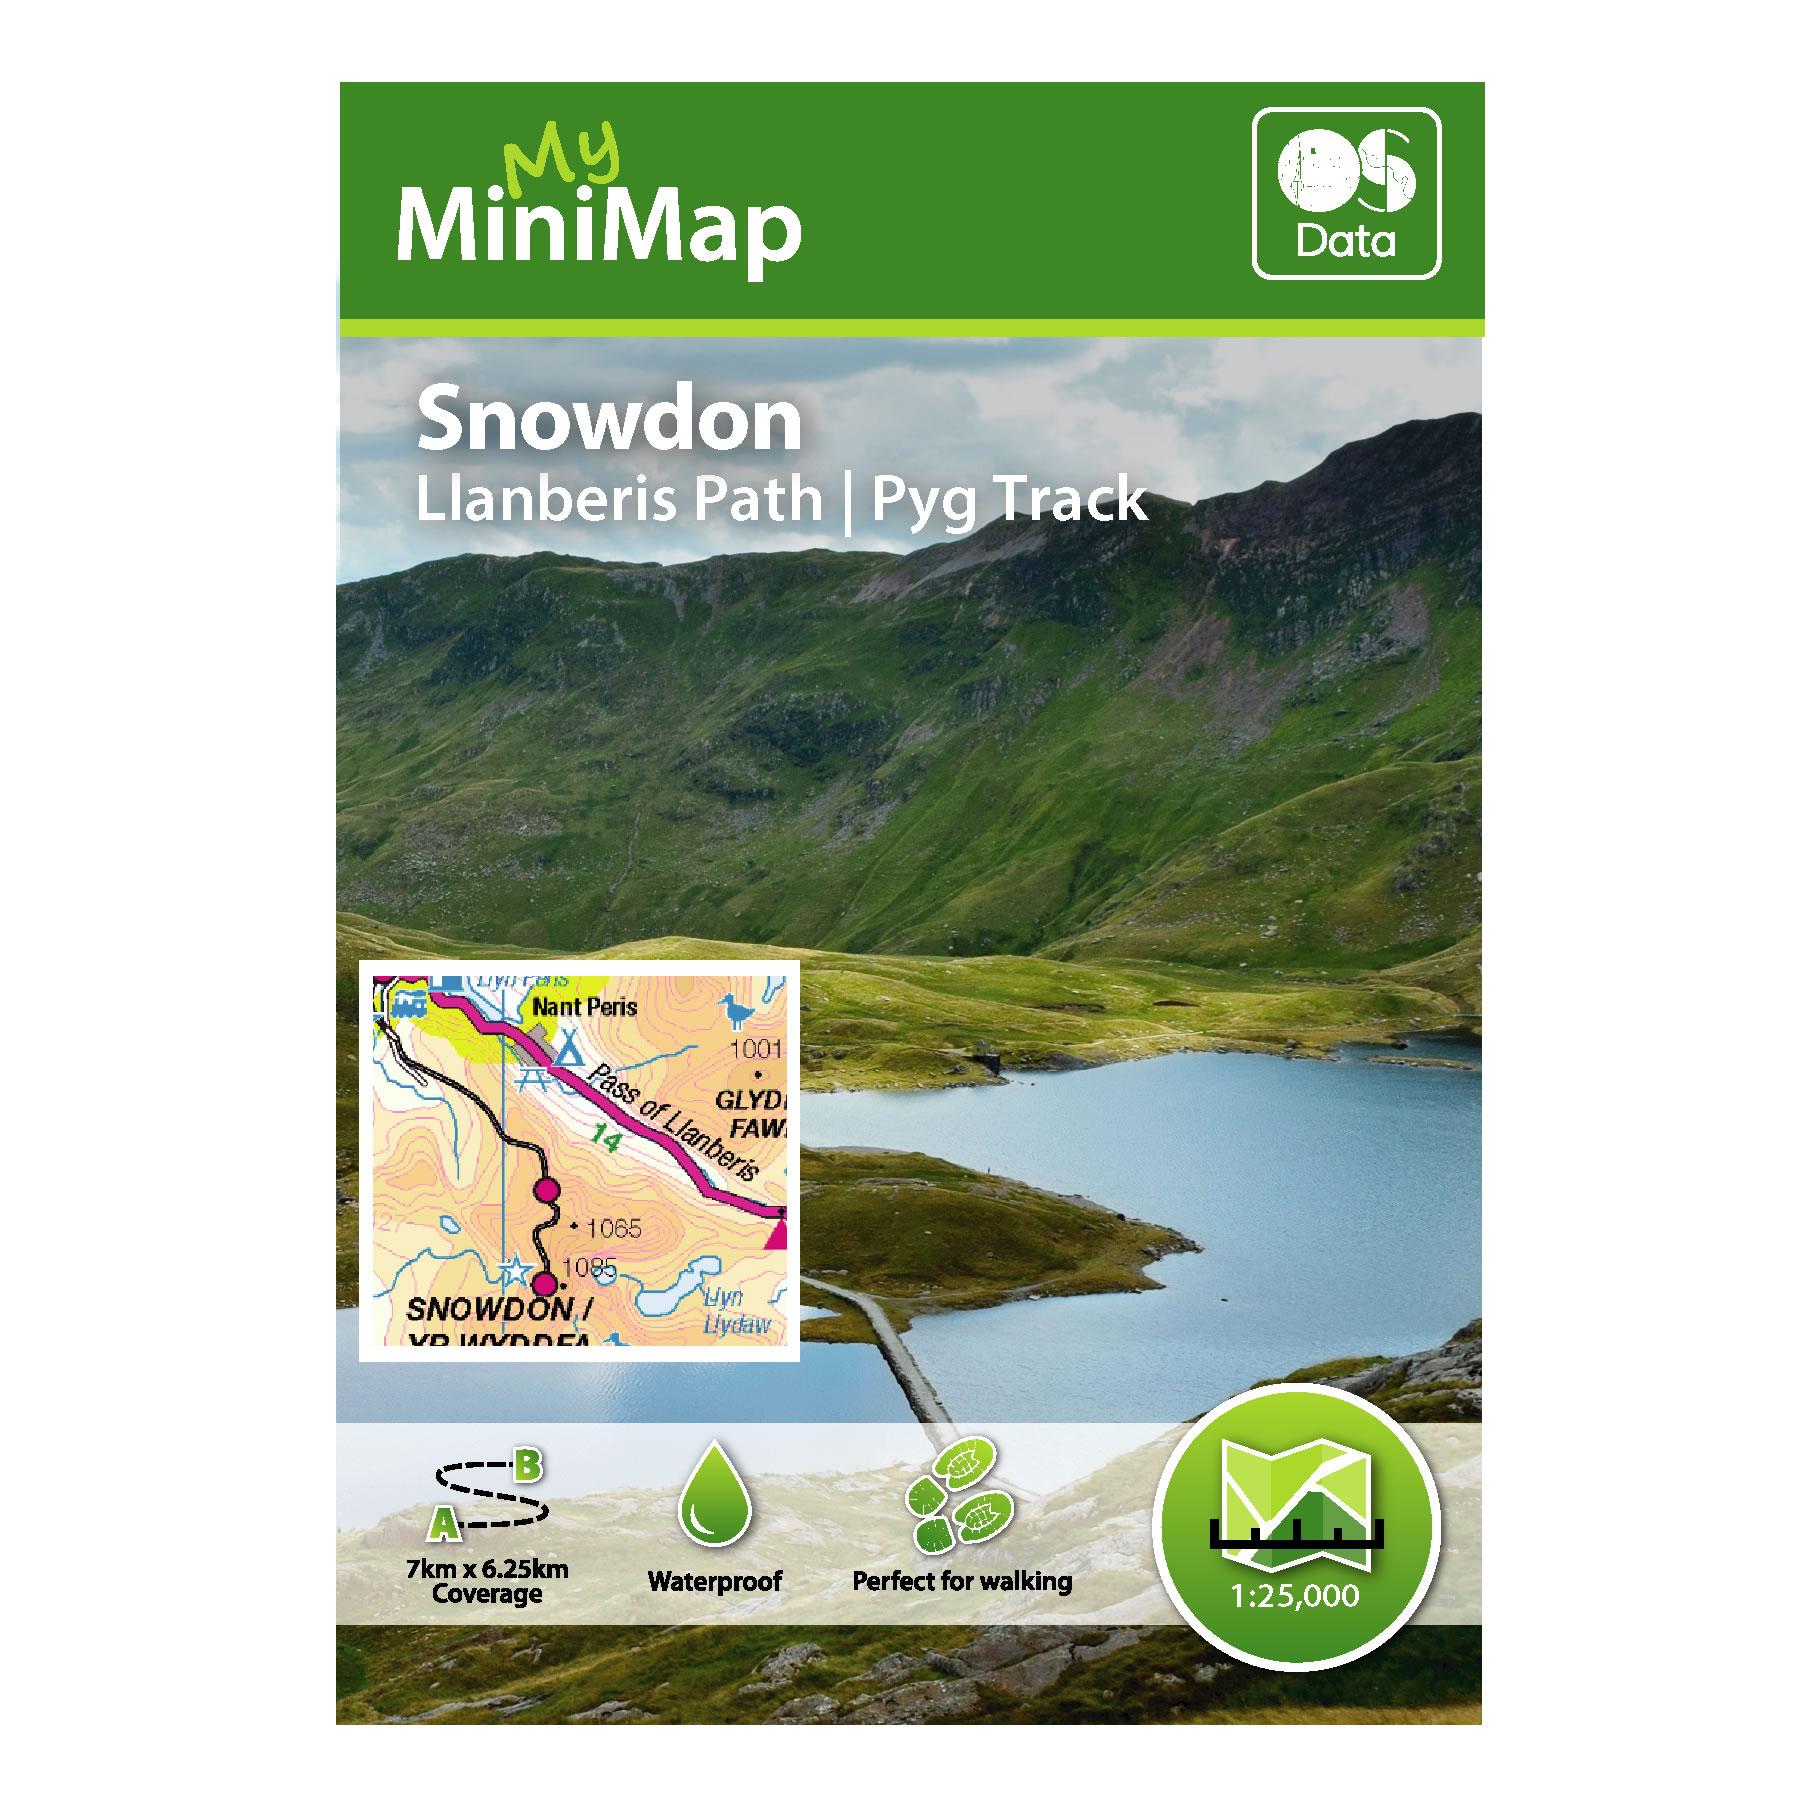 Snowdon 25k | Llanberis Path & Pyg Track